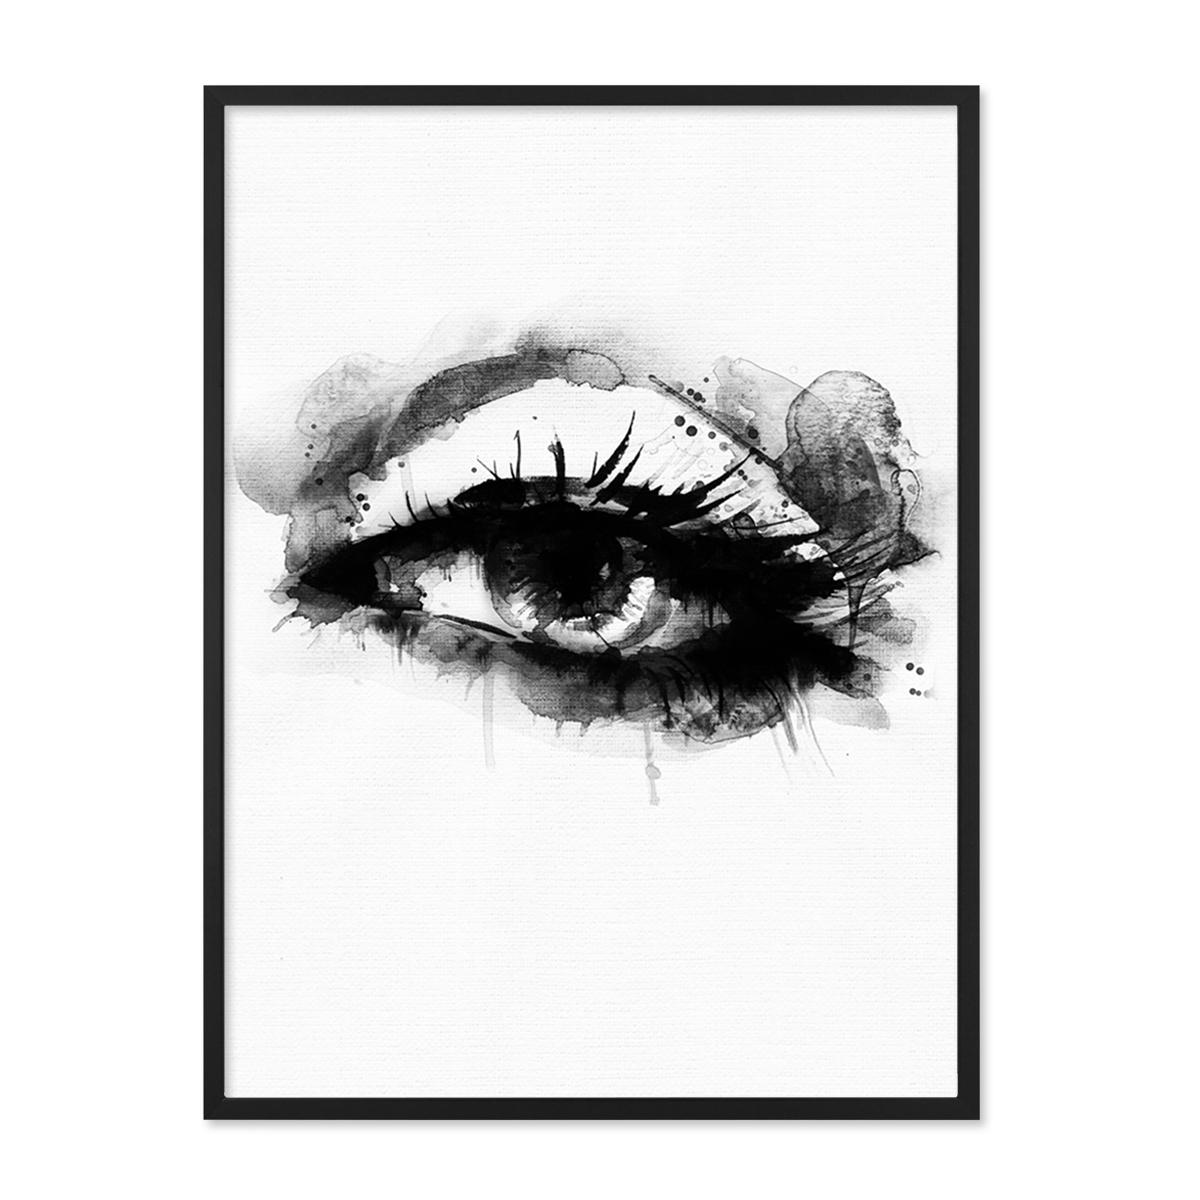 Design Poster Auge 30x40 Cm Schwarz Weiss Aquarell Frauenauge